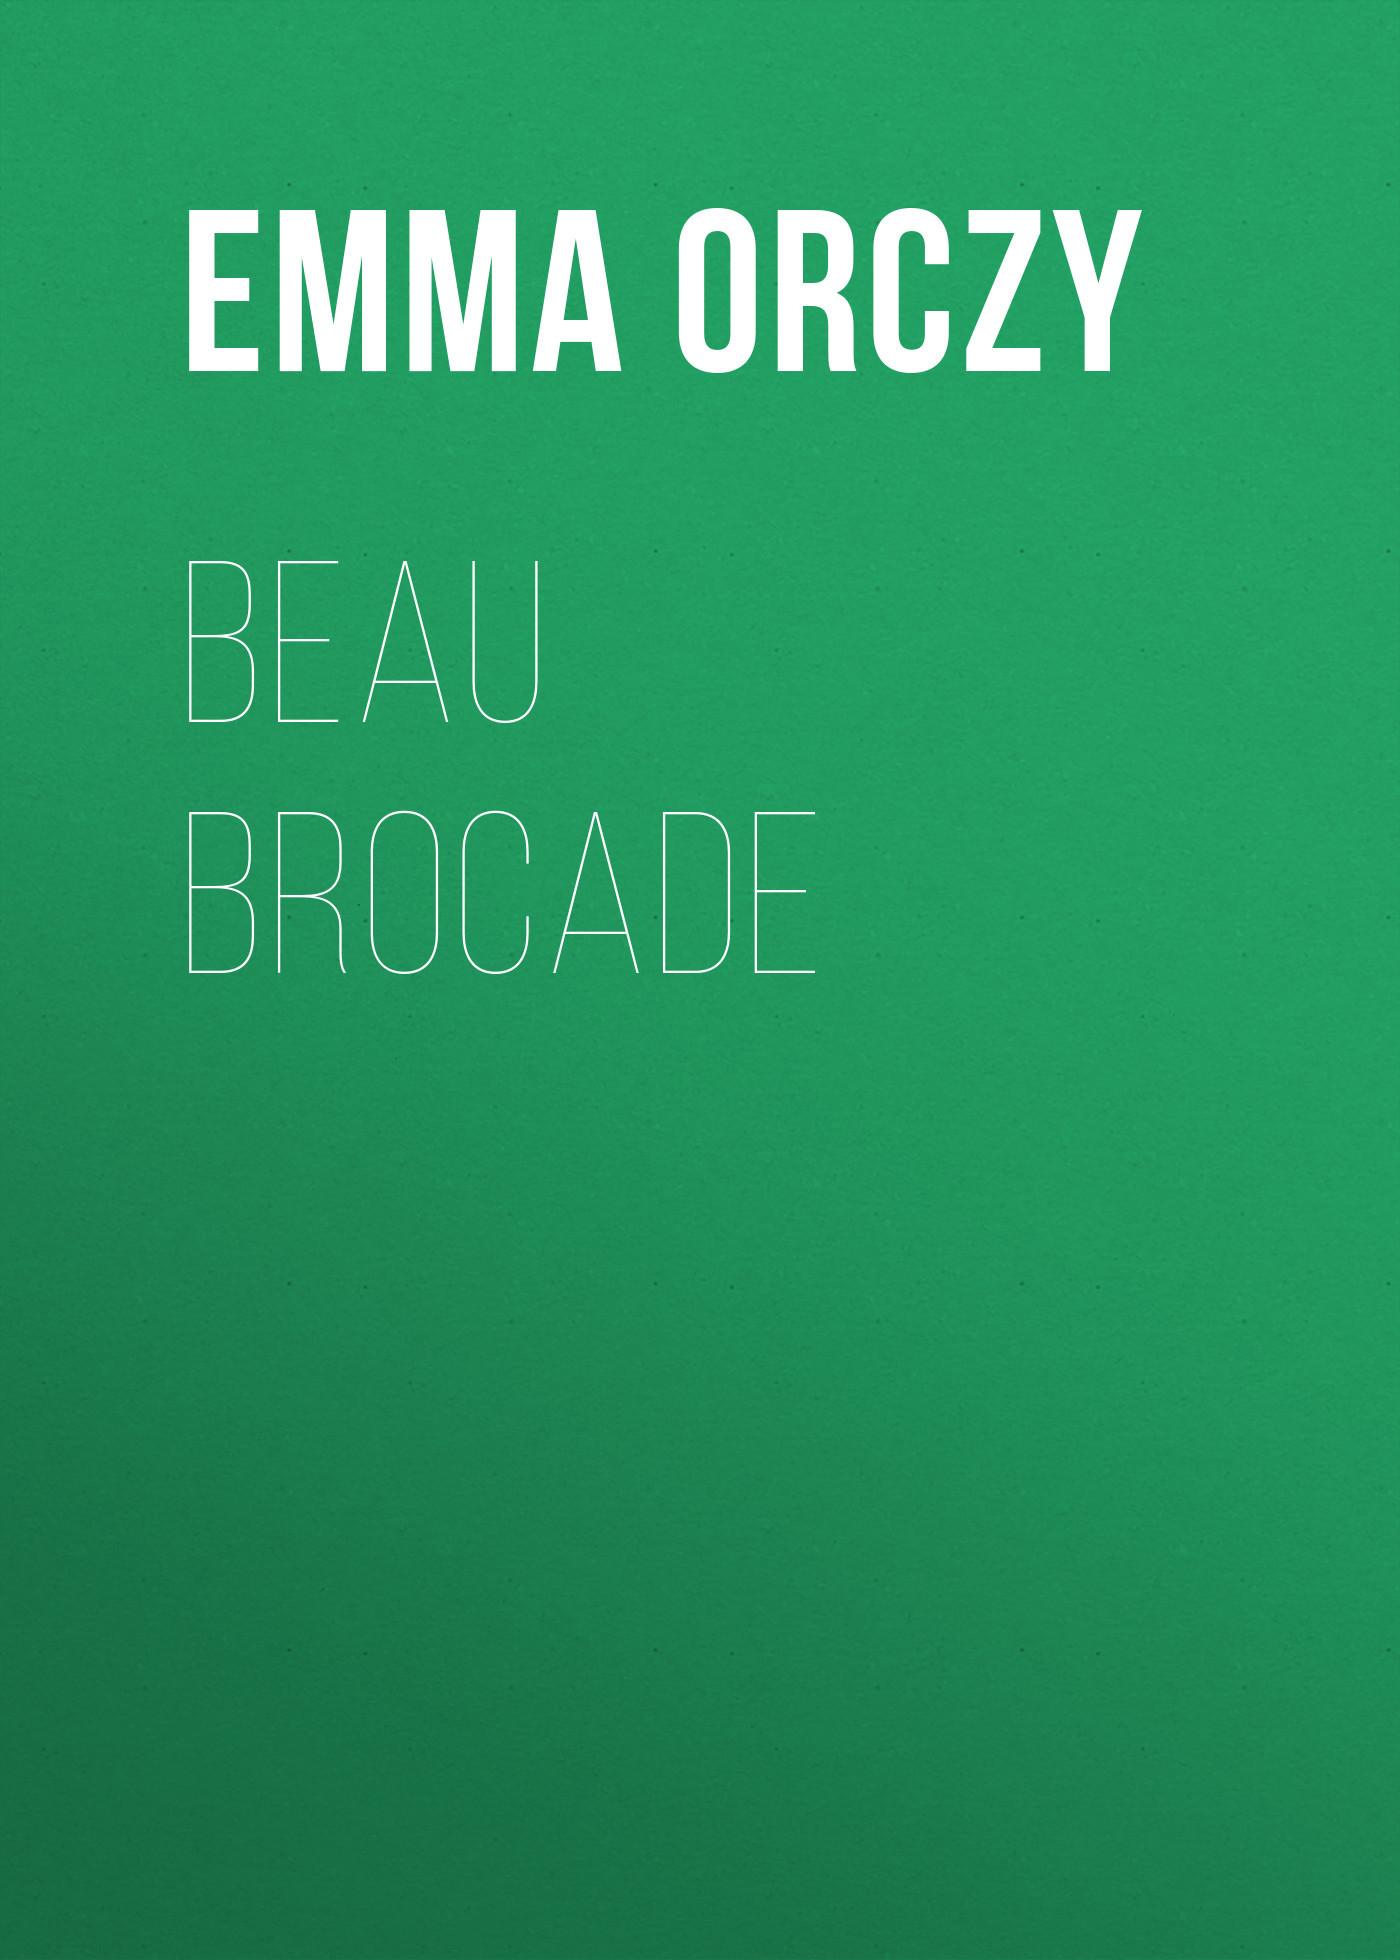 Emma Orczy Beau Brocade: A Romance emma orczy petticoat rule